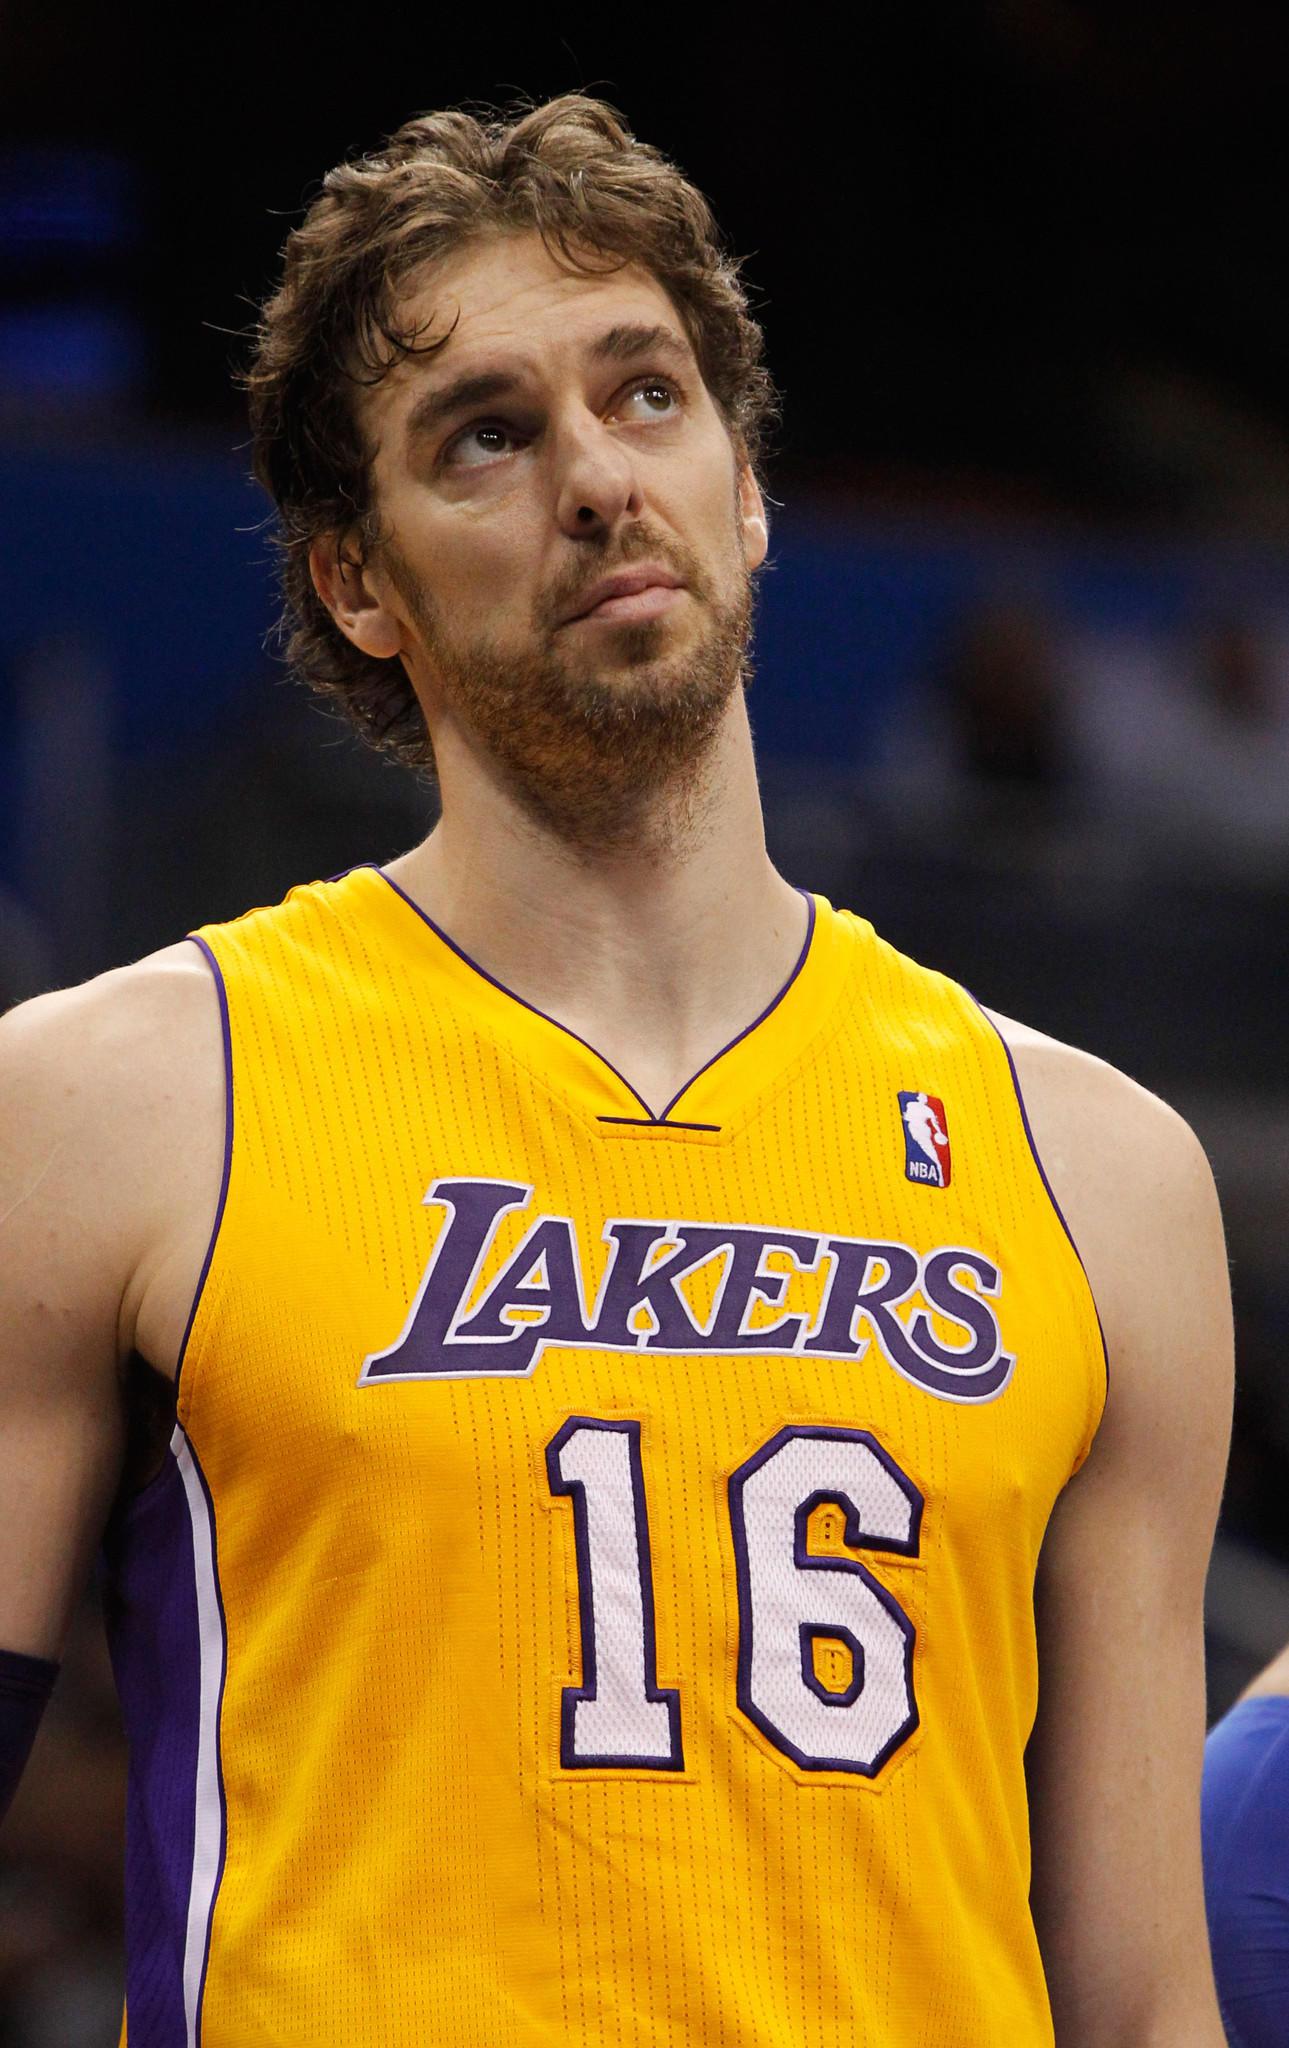 Los Angeles Lakers center Pau Gasol against the Orlando Magic.